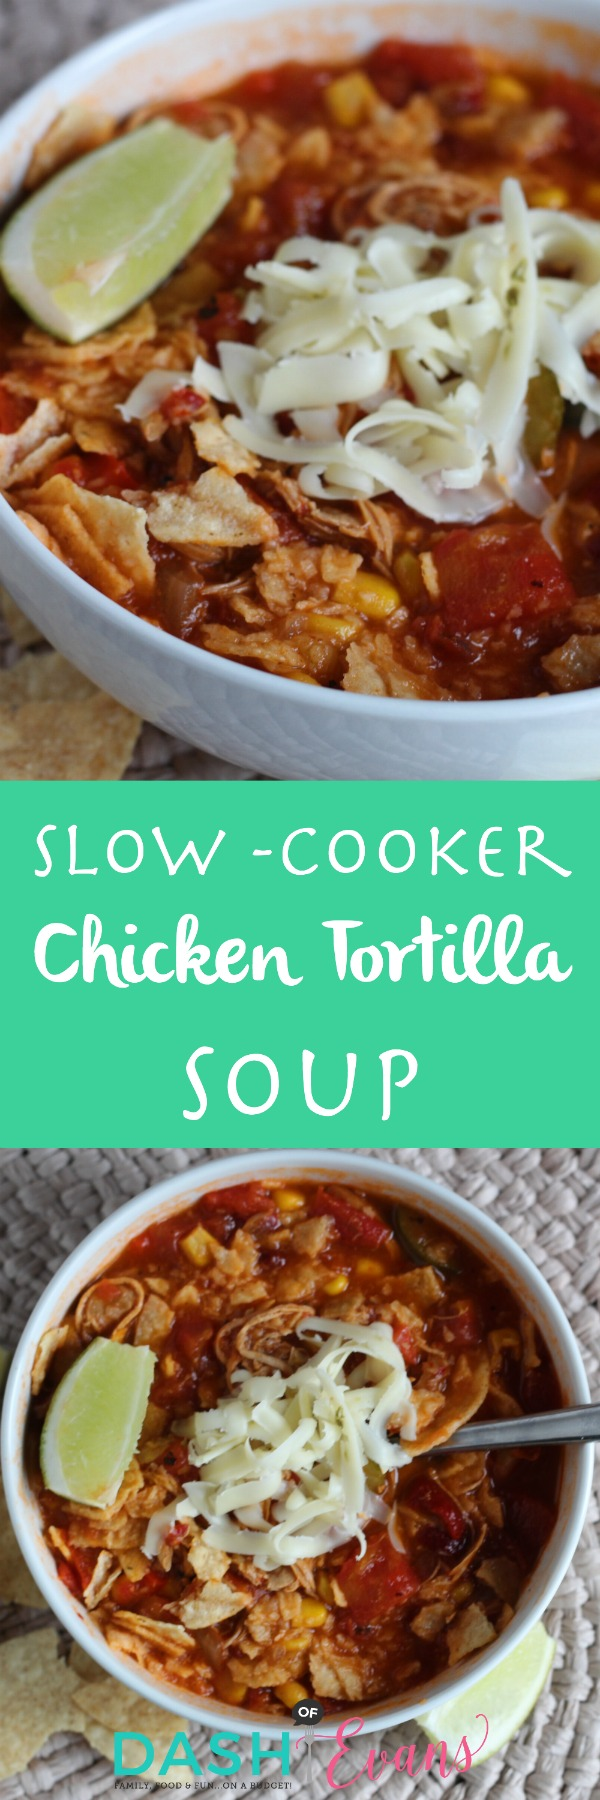 Slow-Cooker Chicken Tortilla Soup. Perfect for any season! via @DashOfEvans